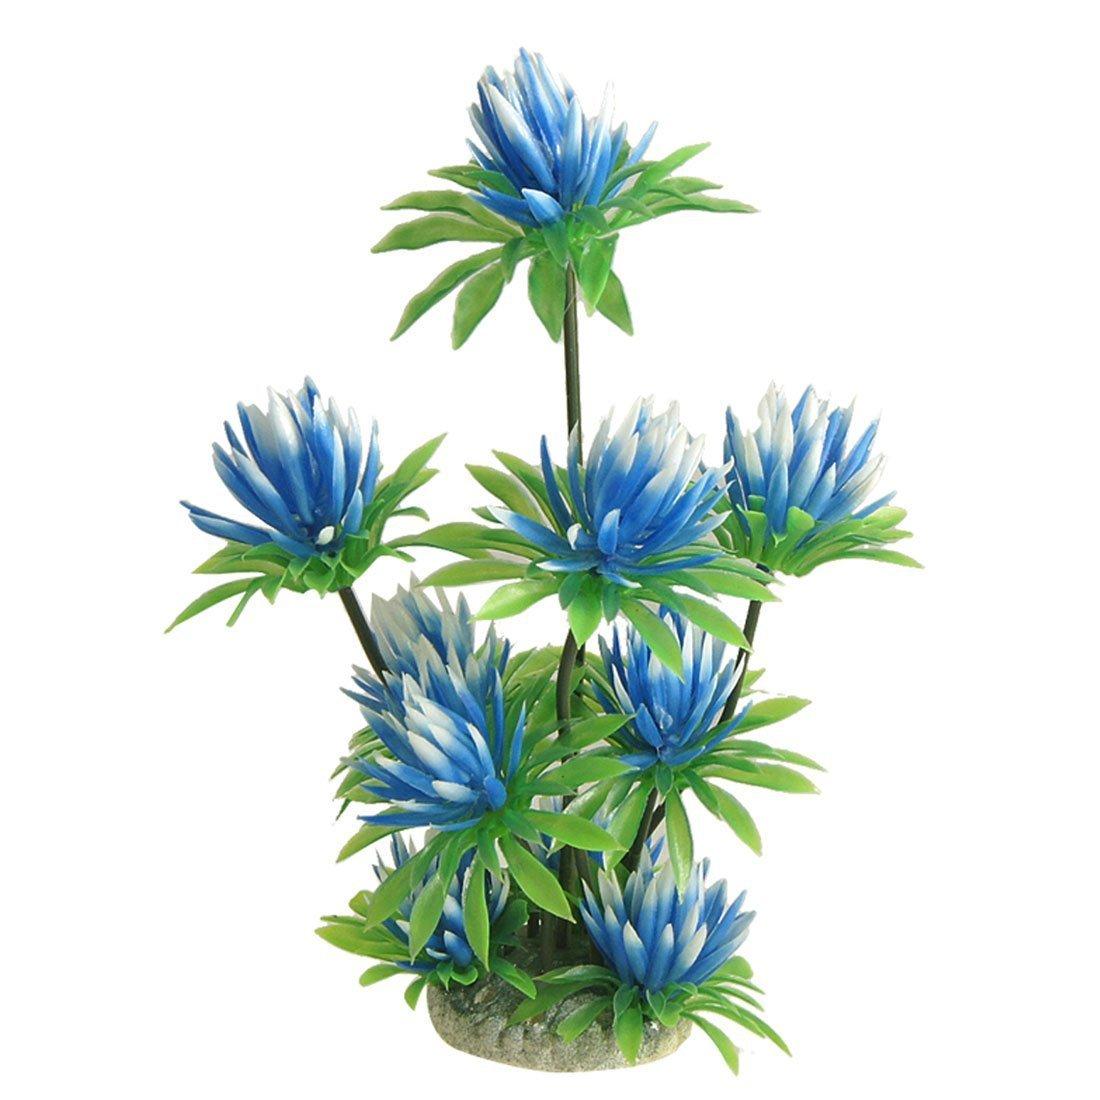 Aquarium Fish Tank Plastic Water Lily Plant Decor Sky bluee Green 10